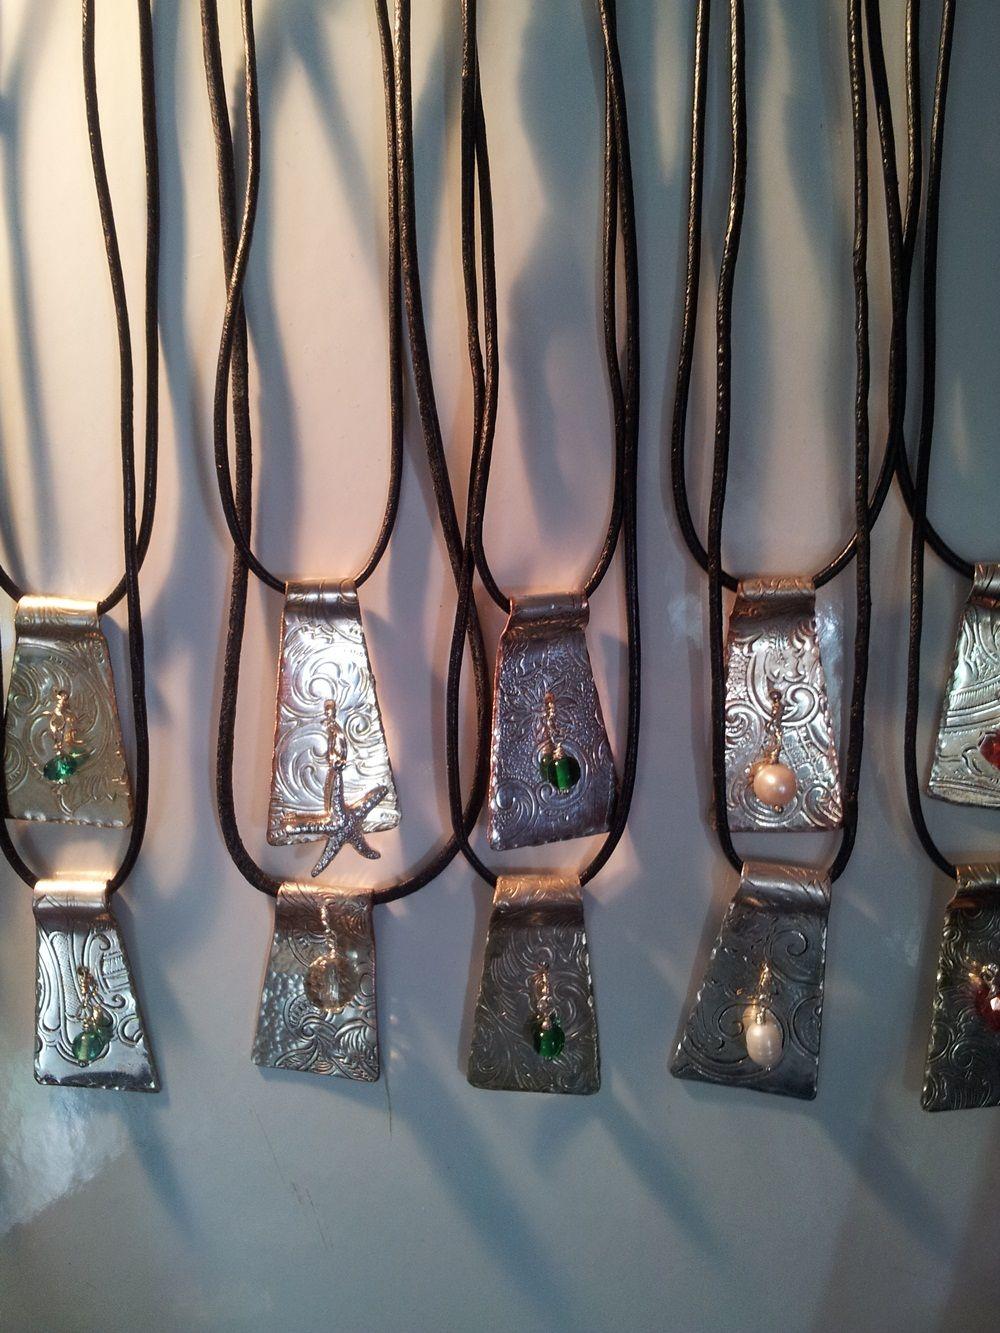 Made From Old Silver Trays Things Hazel Glass Eye Wire Wrap Pendant By Kimsjewels On Etsy Silverware Jewelry Cutlery Art Metal